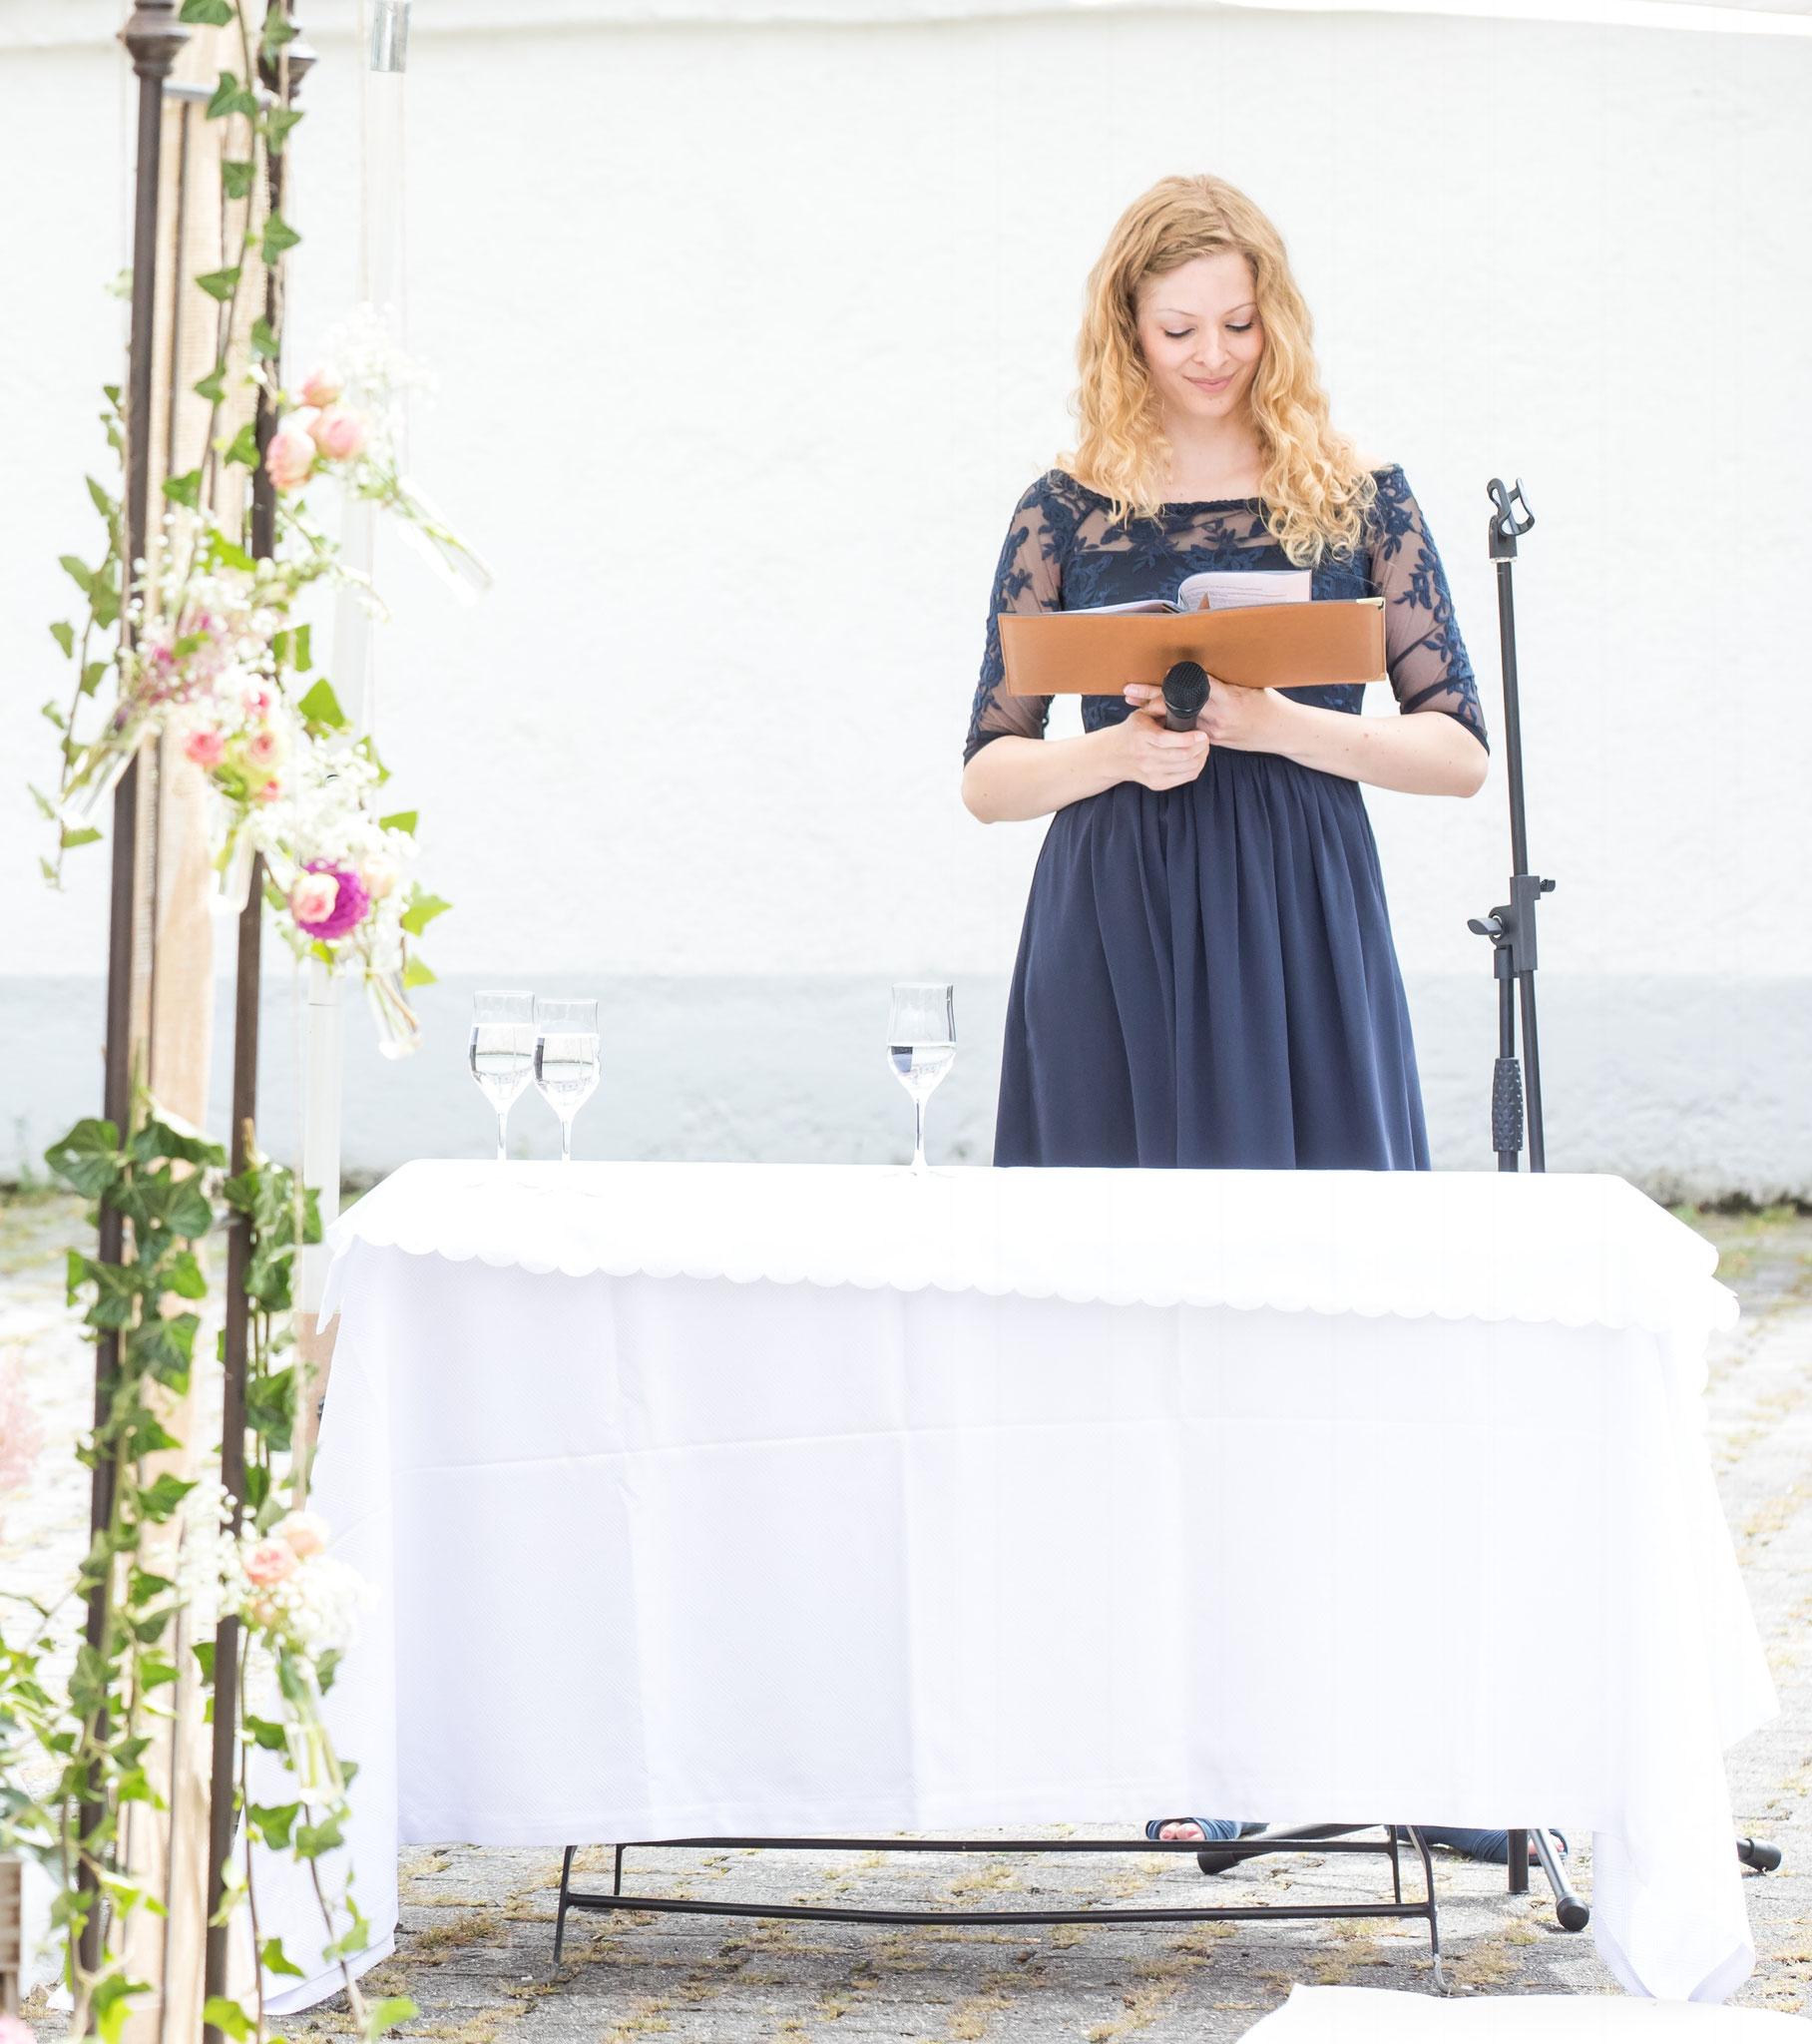 Traurednerin Katharina Lehmkuhl bereitet sich vor (Foto: Robert Klinger)